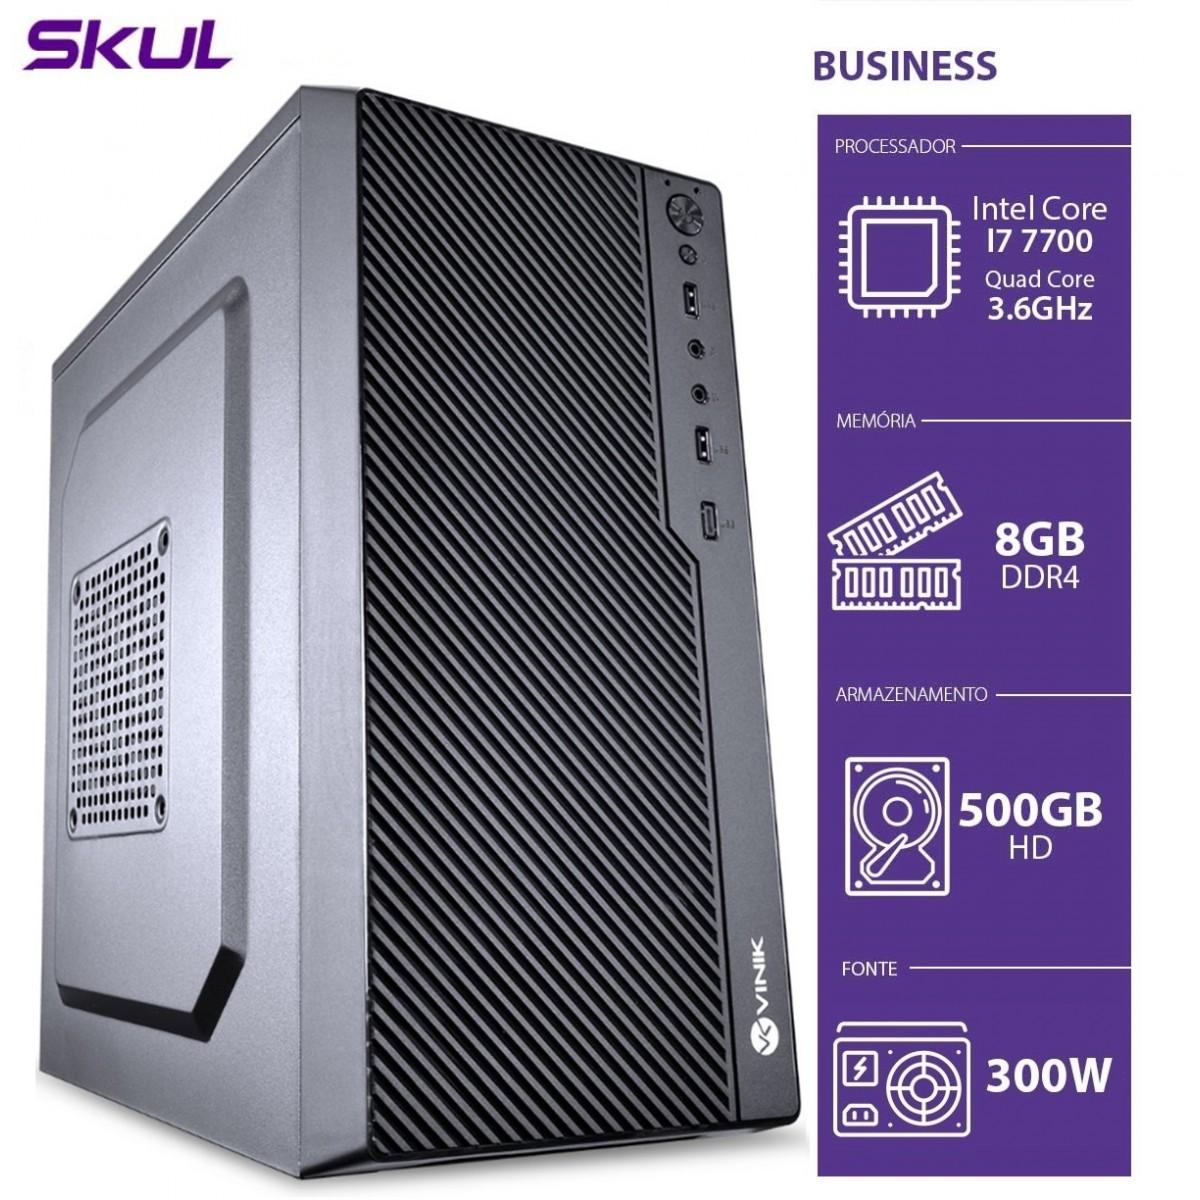 Computador Skul T-Home Business B700 i7 7700 / 8GB DDR4 / HD 500GB  / HDMI/VGA / FONTE 300W